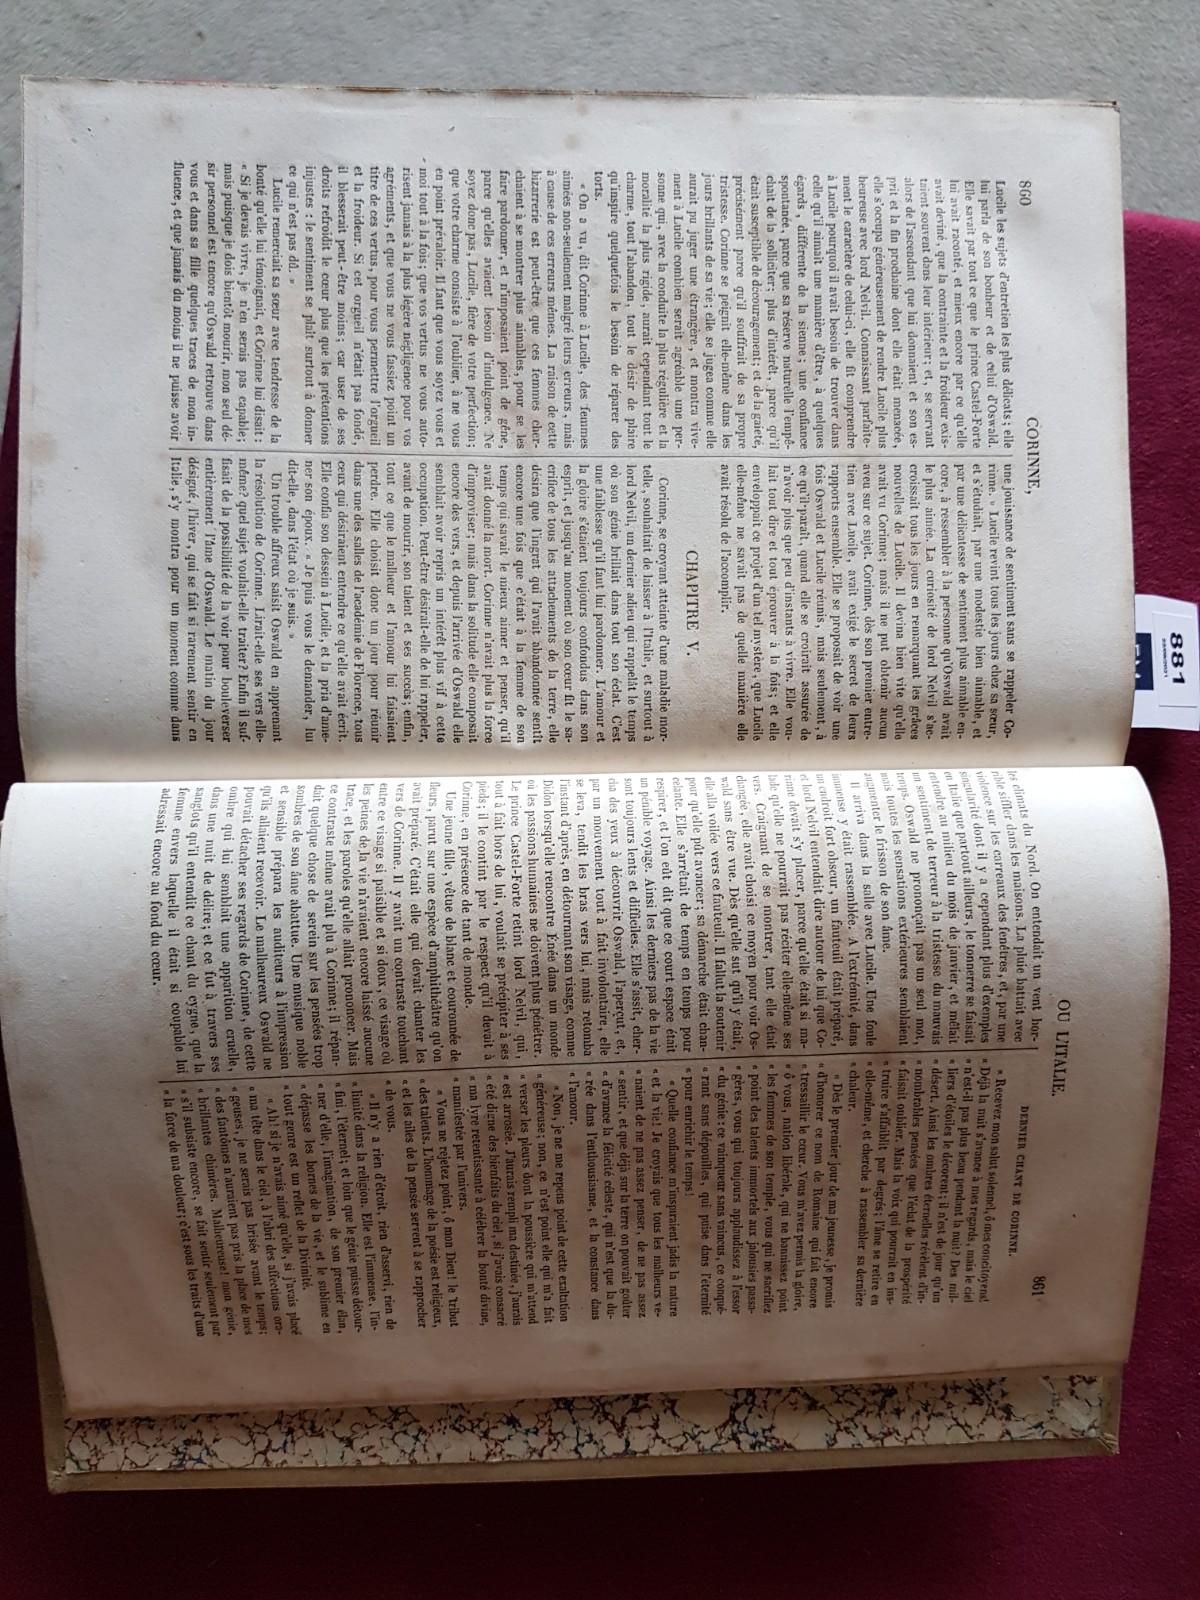 De Stael (Madame)ÿOeuvres Completes de Madame la Baronne de Stael-Holstein, 2 vols. folio Paris ( - Image 5 of 8